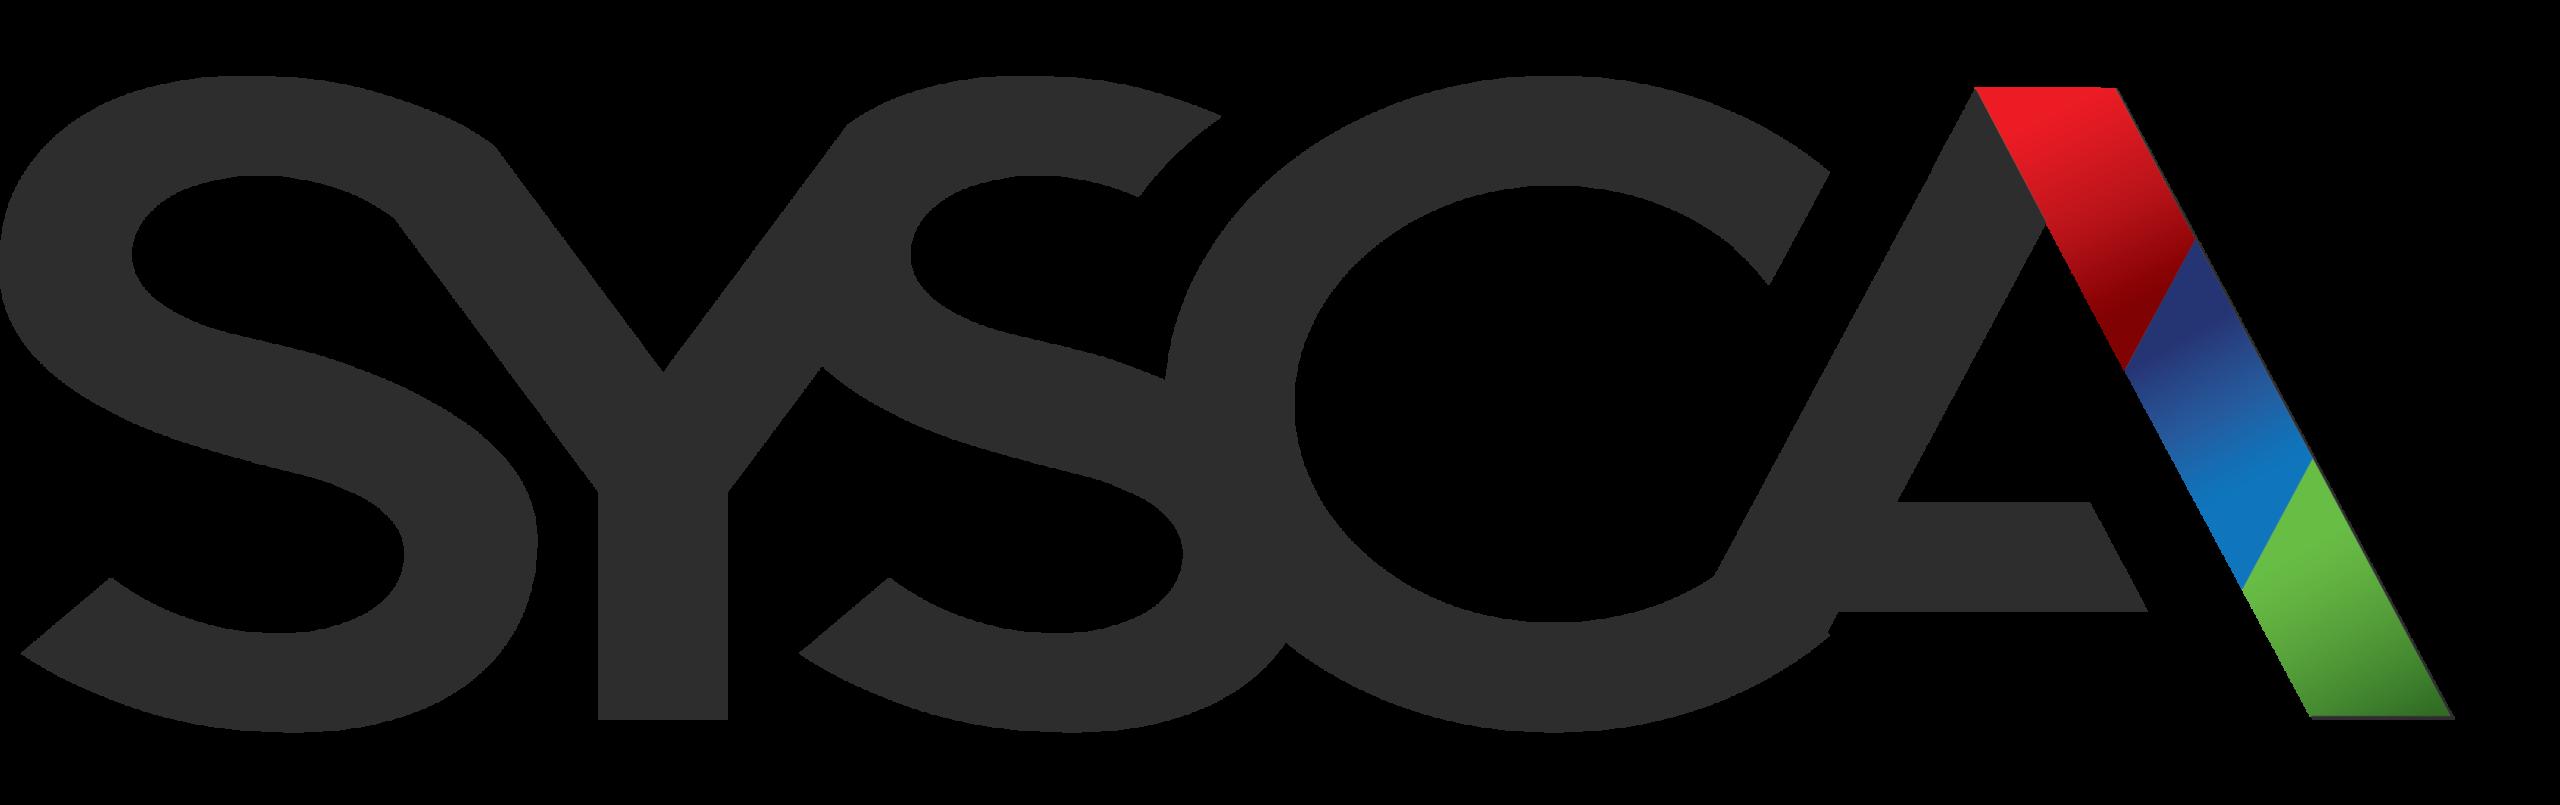 Sysca SA